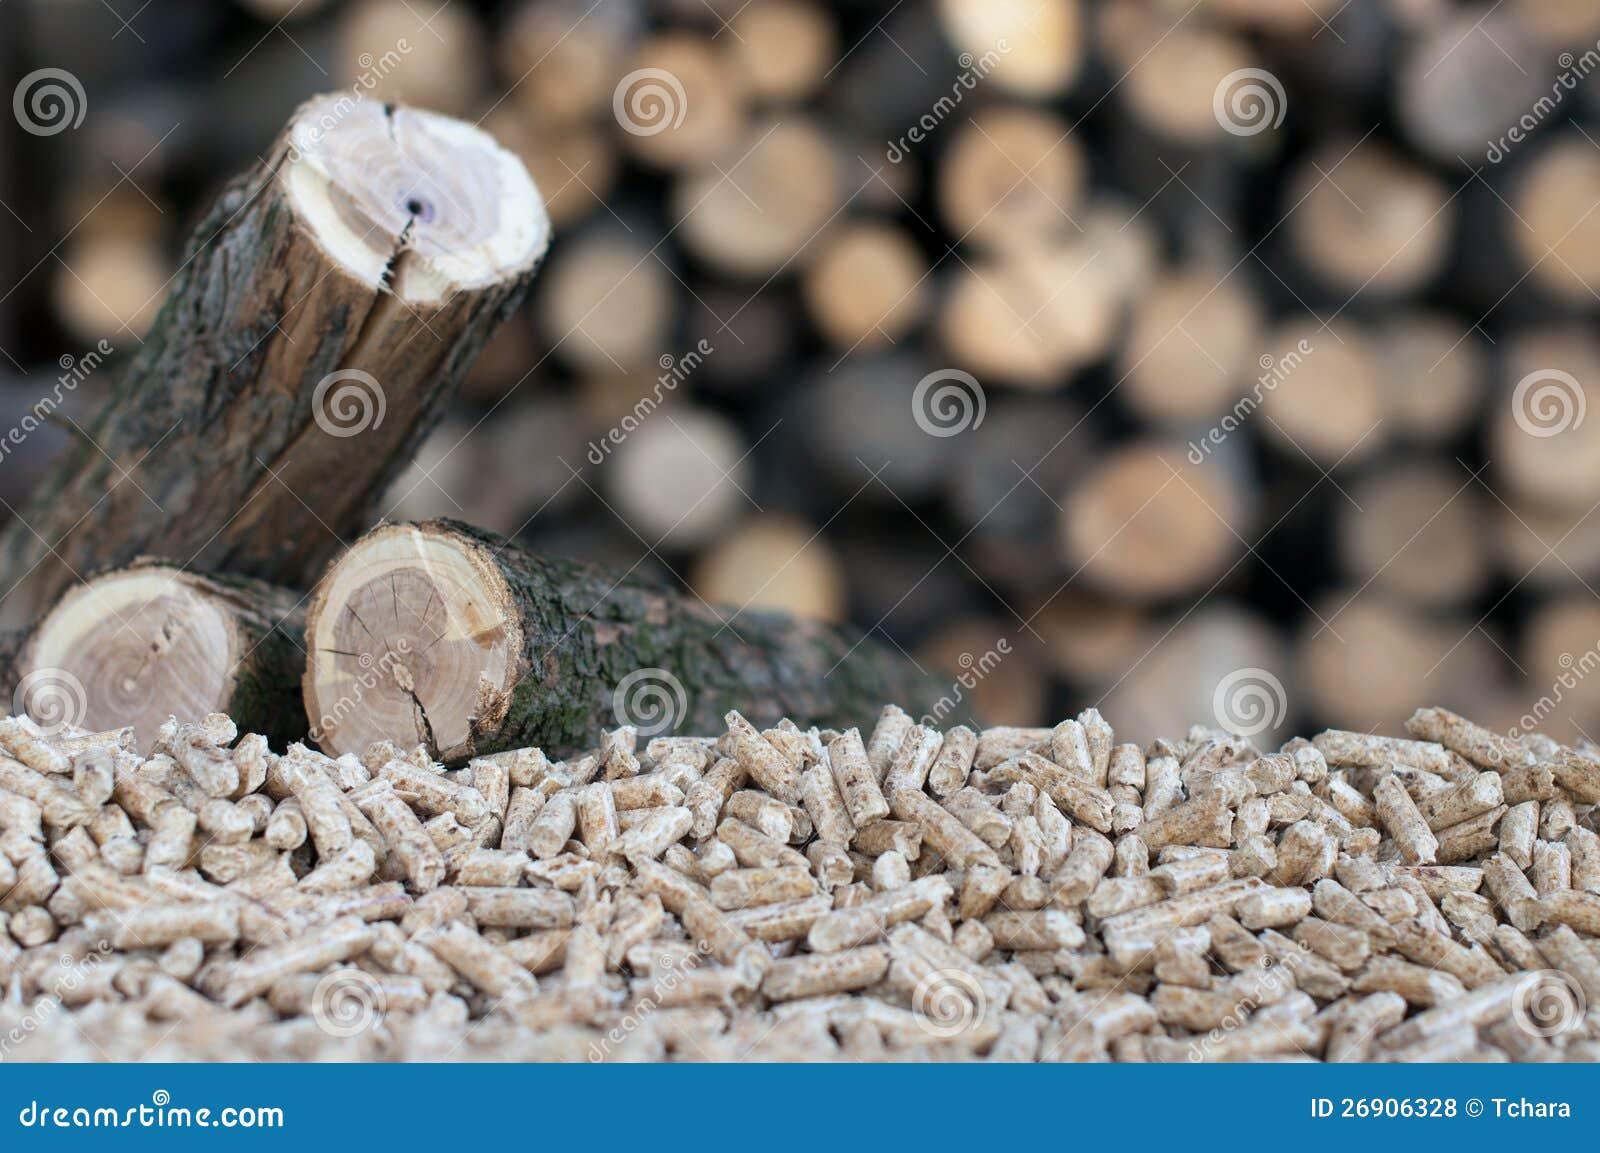 pellets biomass royalty free stock photos image 26906328. Black Bedroom Furniture Sets. Home Design Ideas